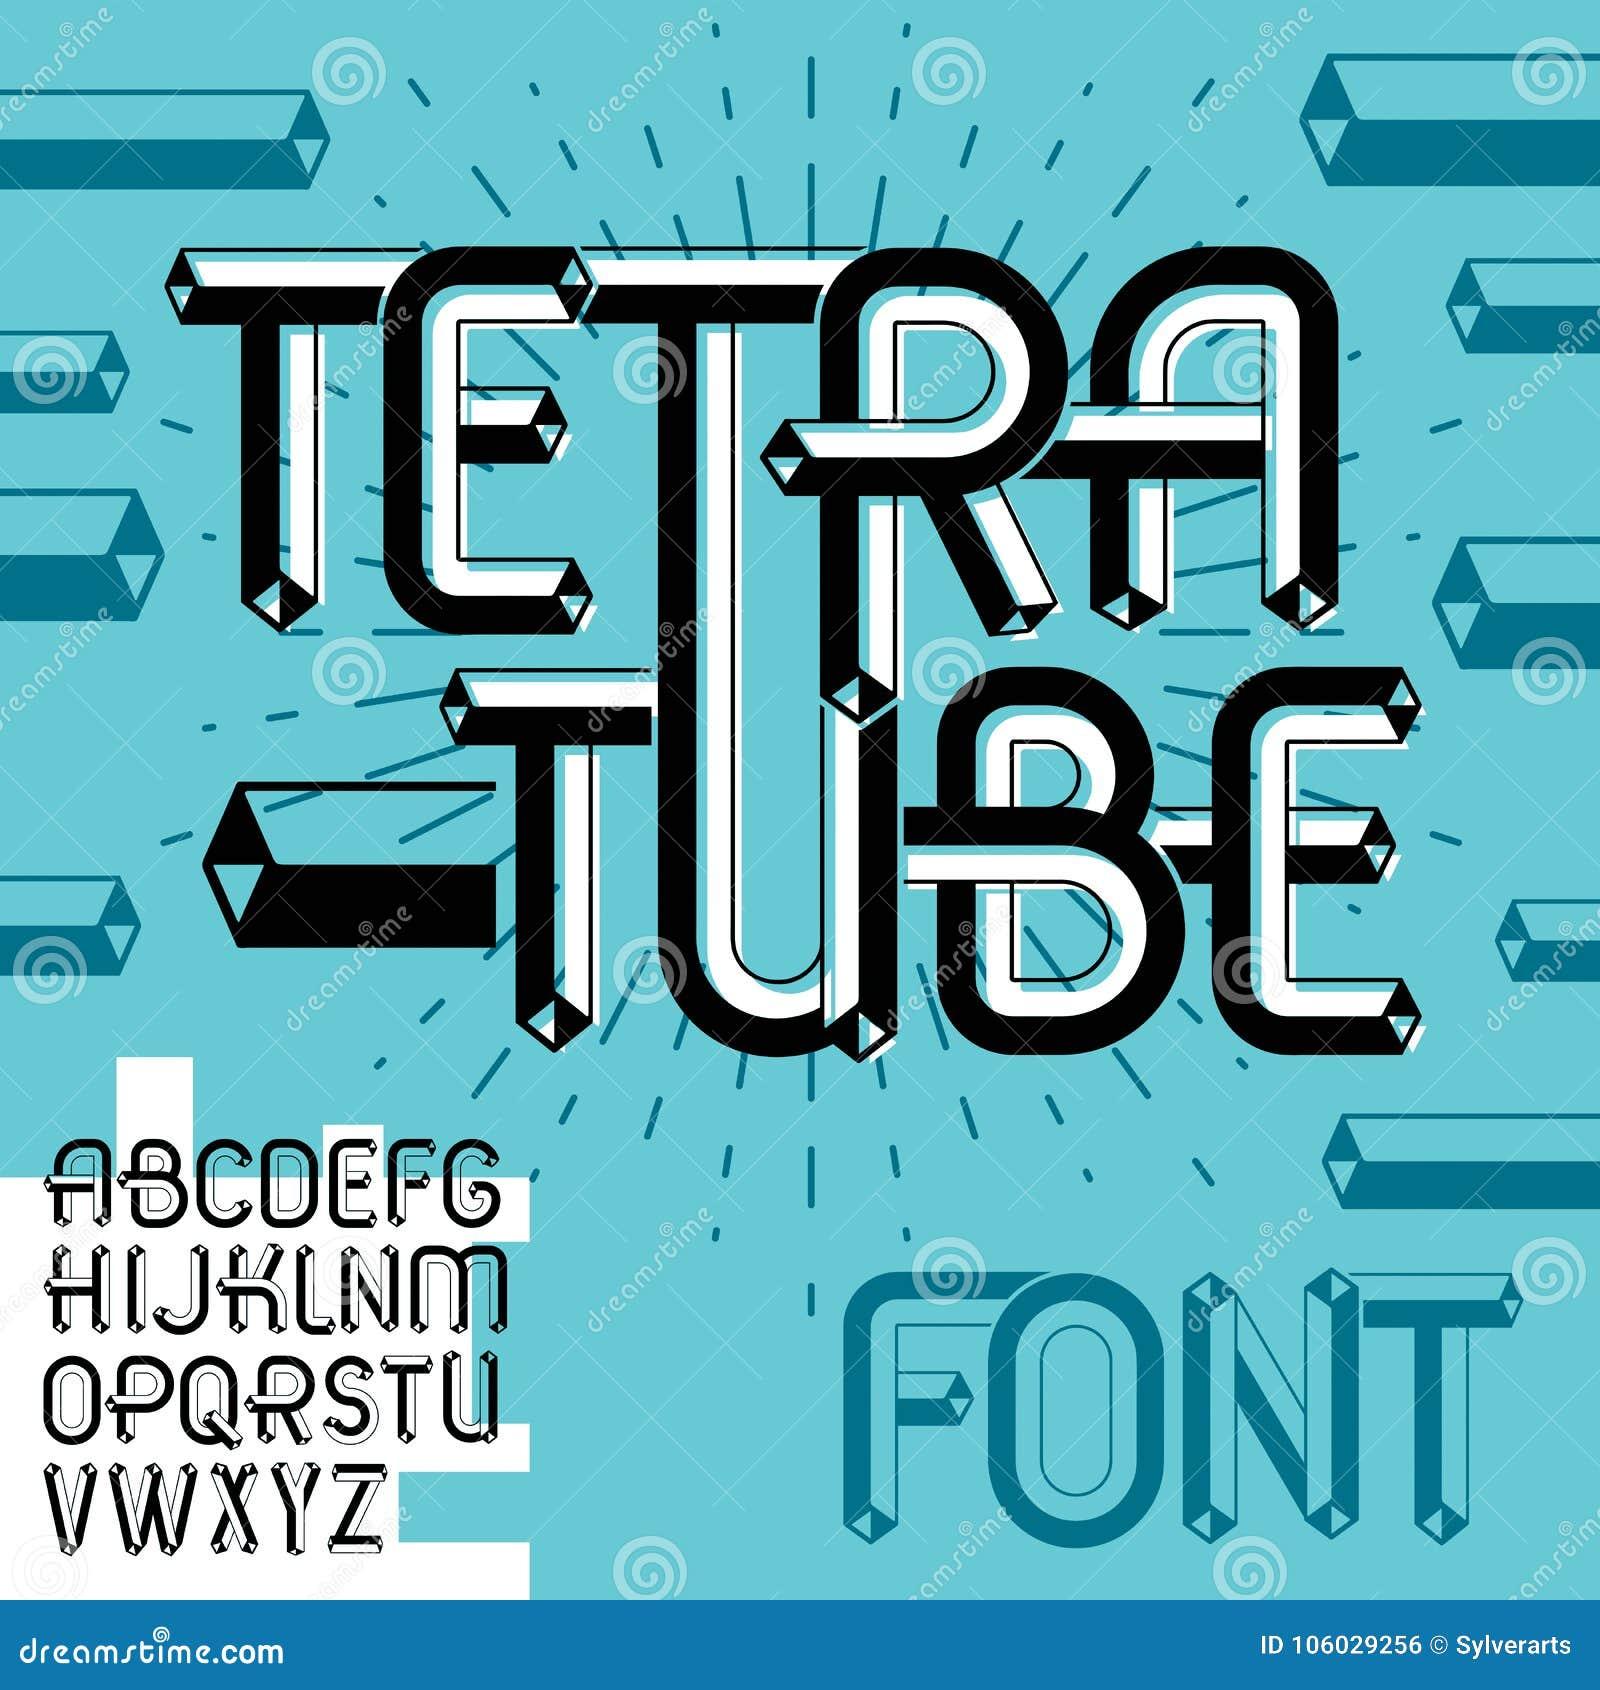 Abc Creation dedans vector trendy vintage capital english alphabet letters, abc coll